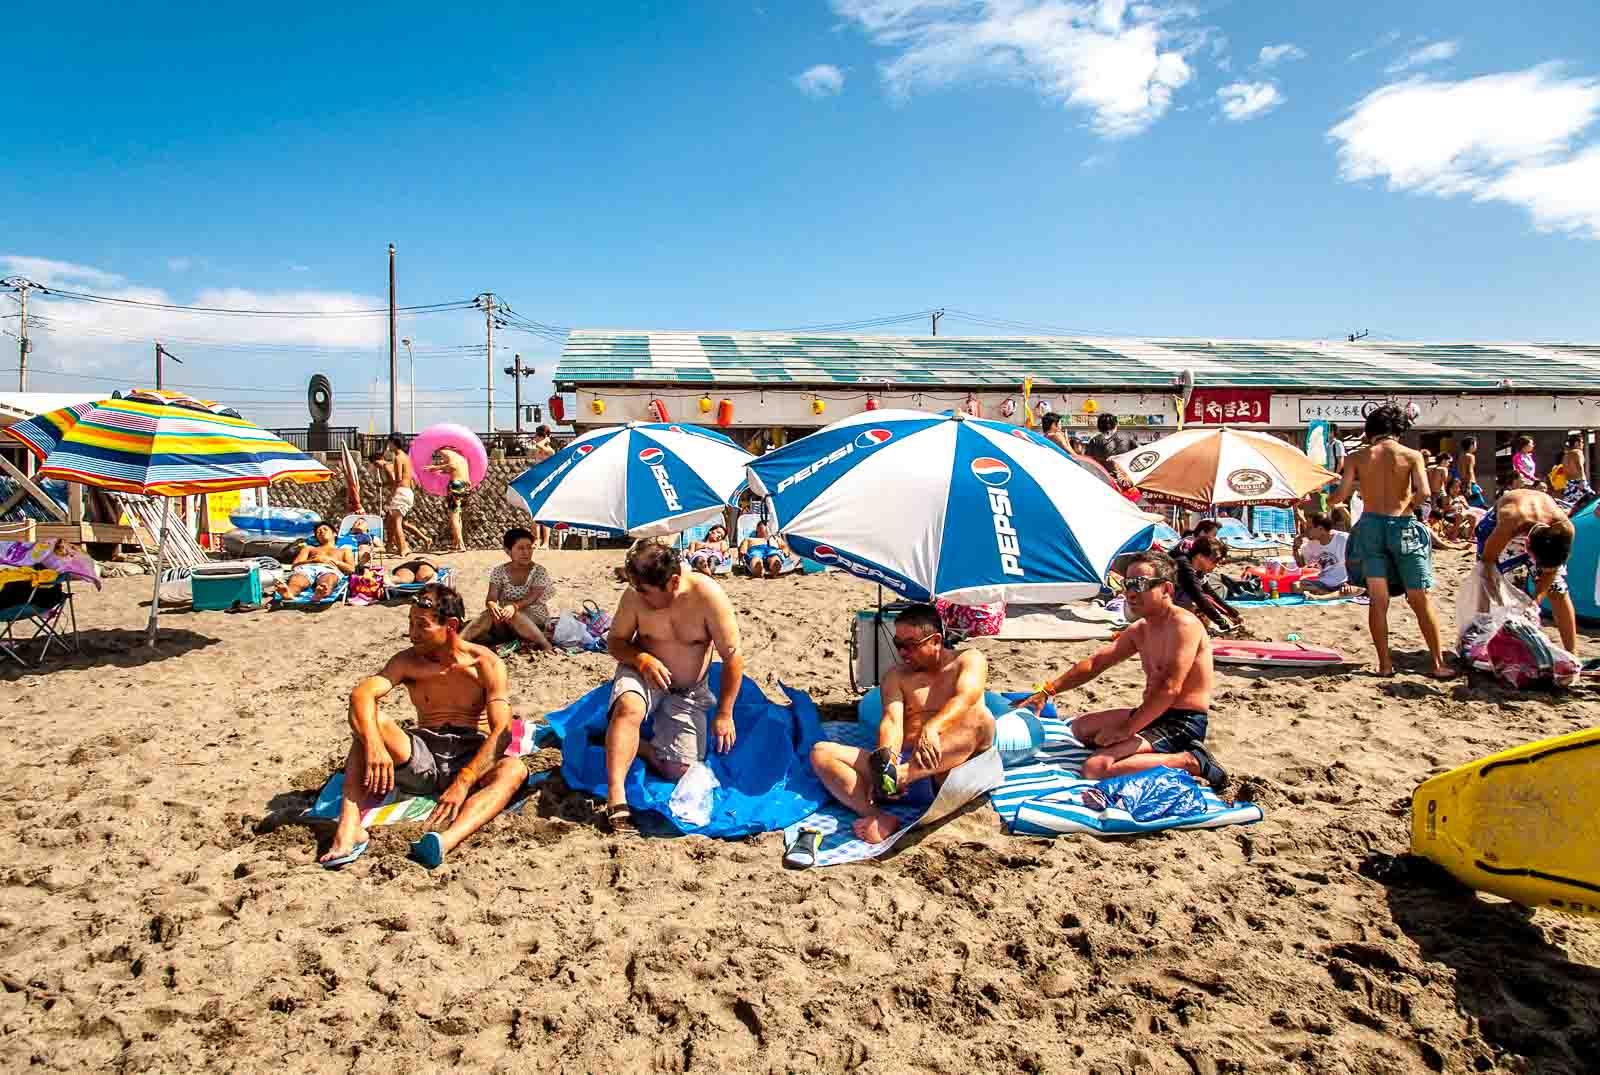 Yuigahama Beach in Kamakura, Japan, home of the 2020 Summer Japan Olympic sailing events